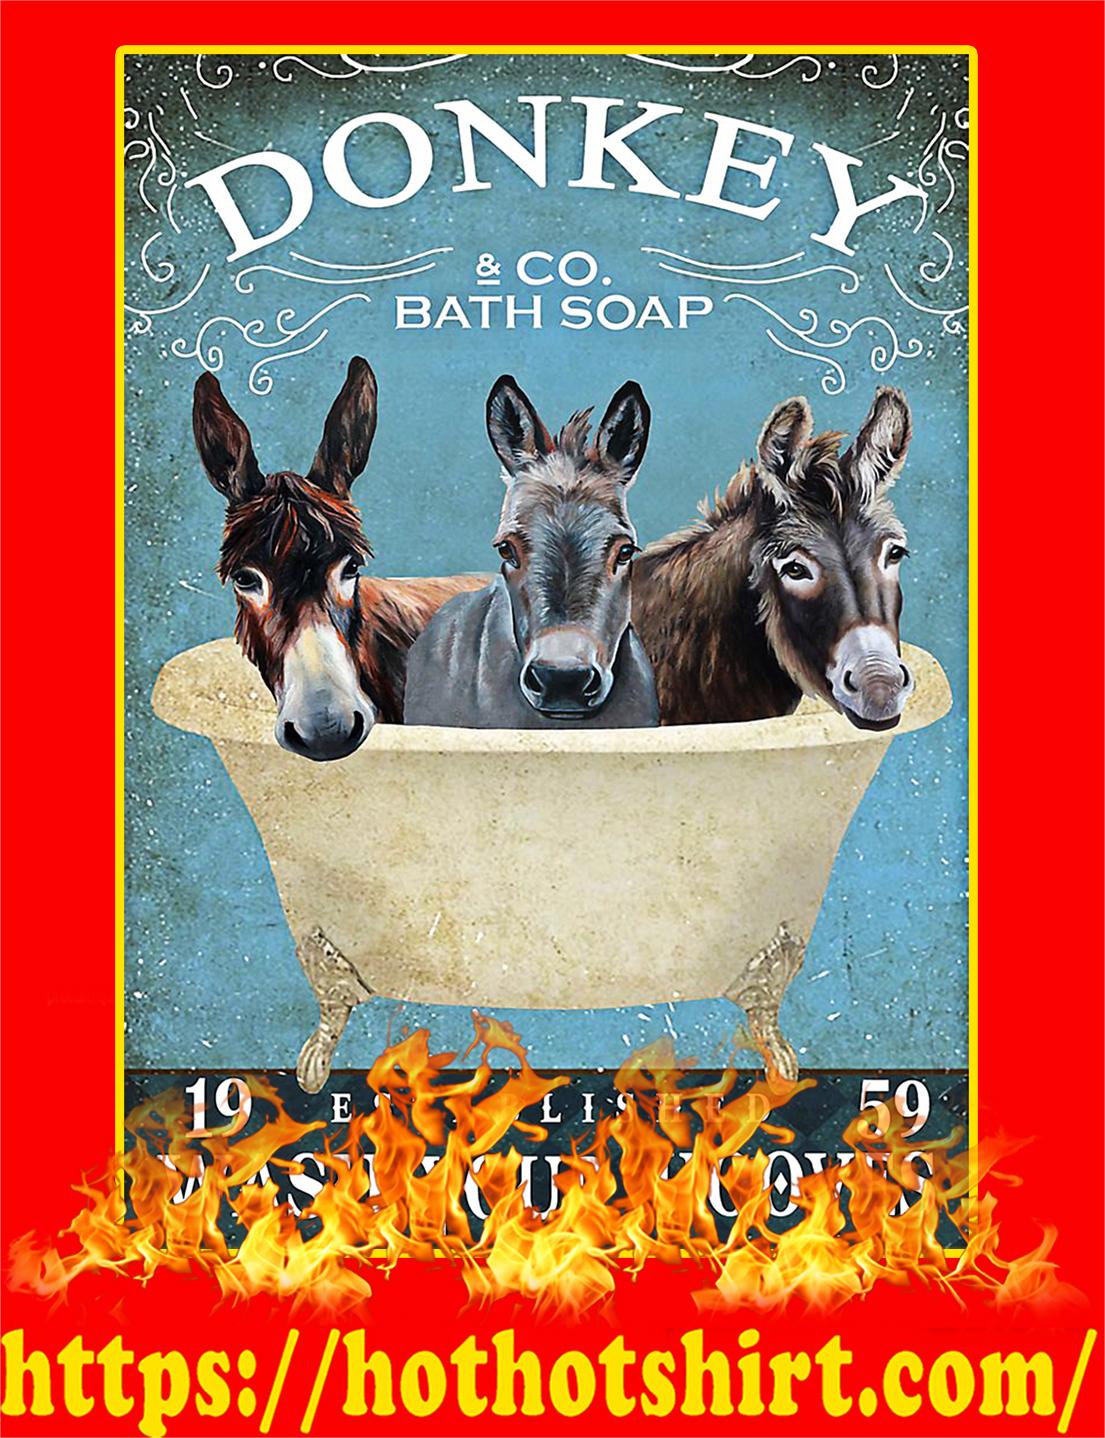 Donkey Company Bath Soap Poster - A3